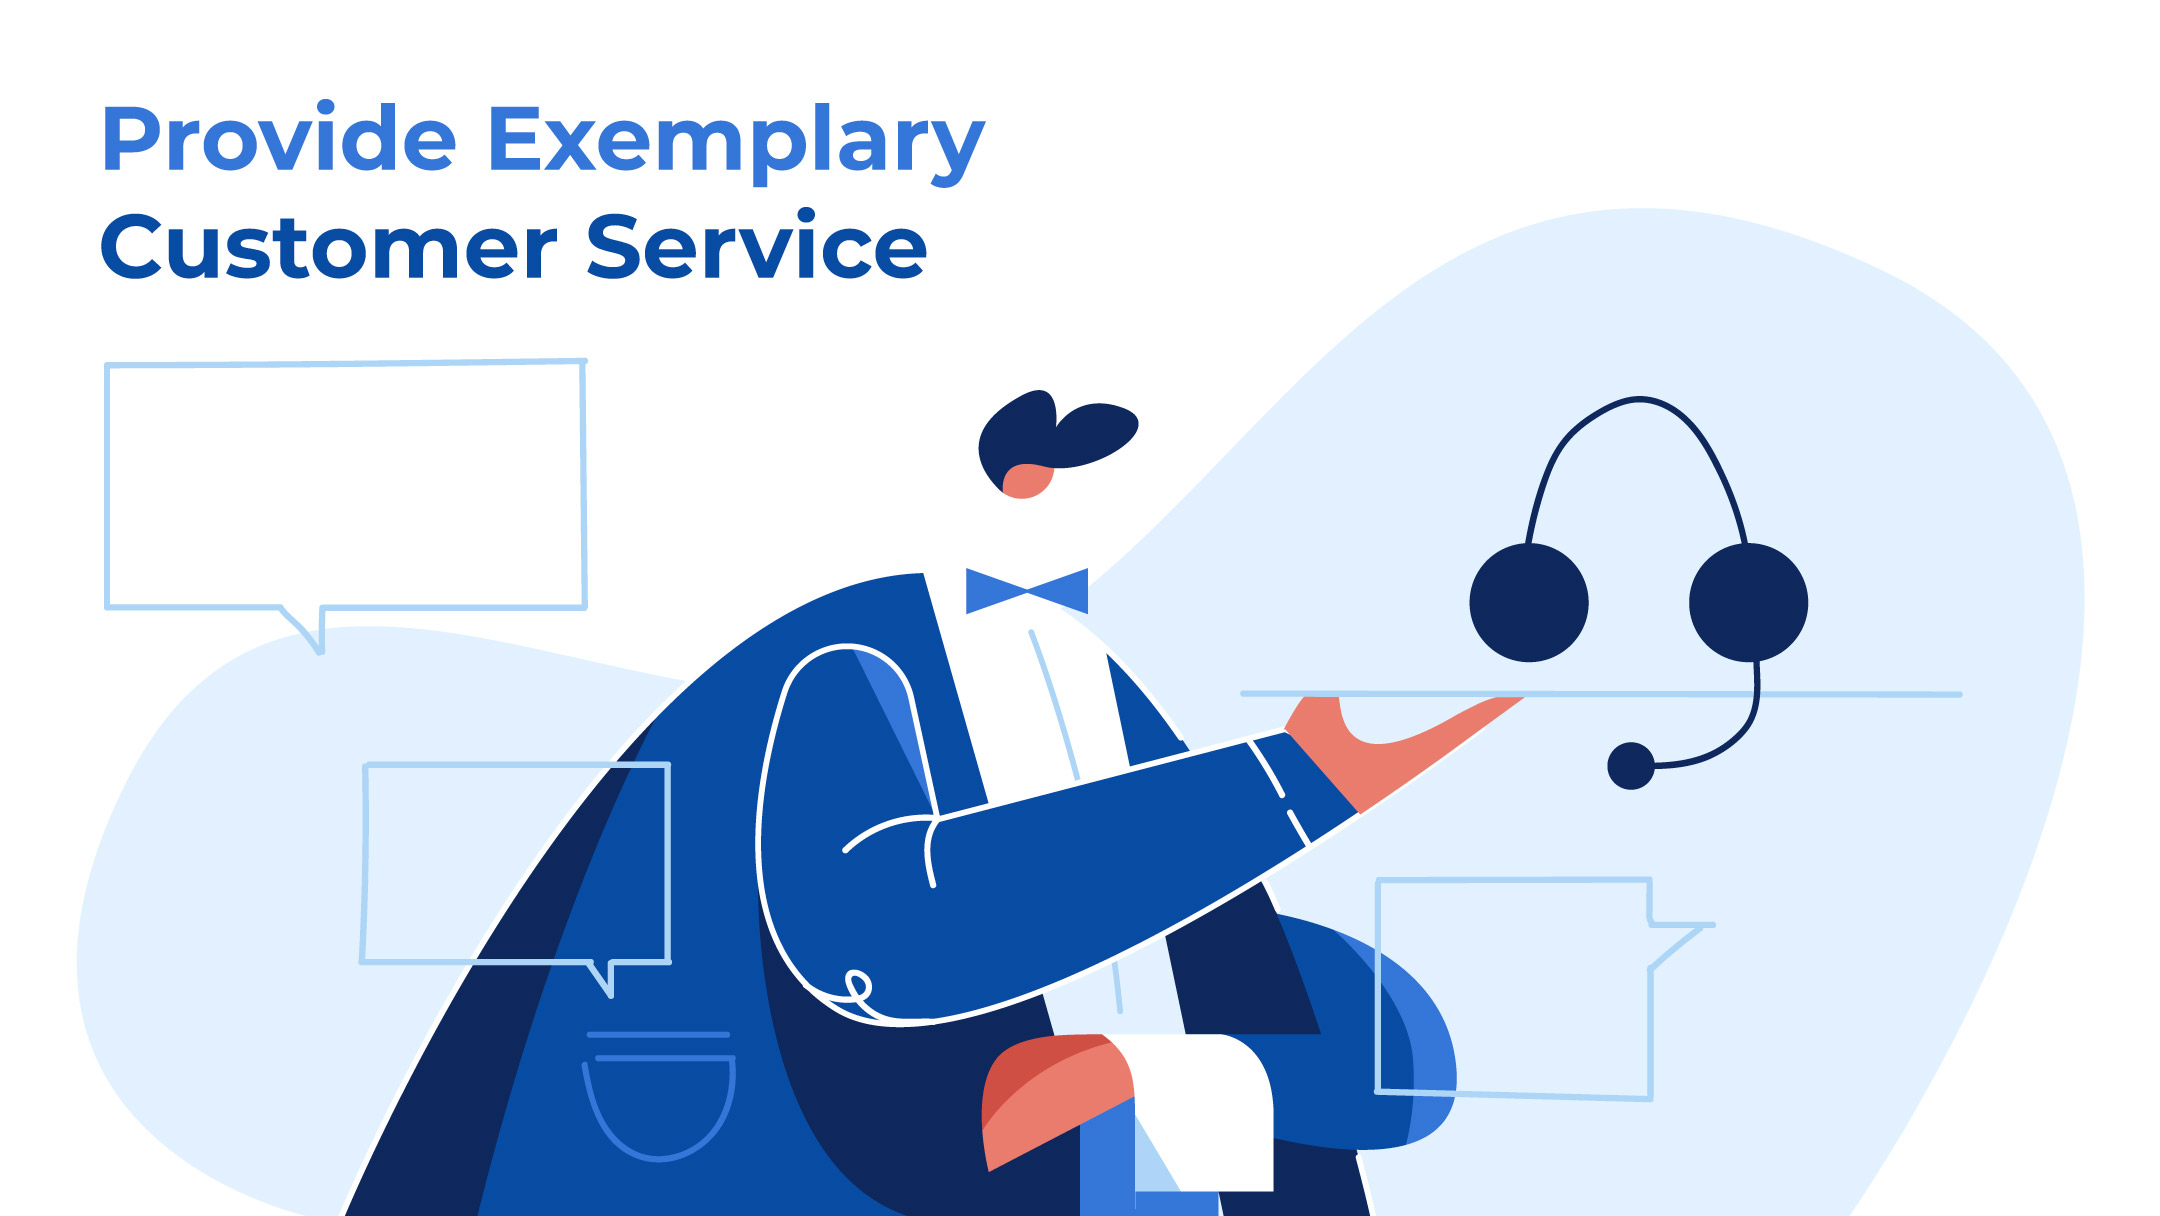 provide exemplary customer service